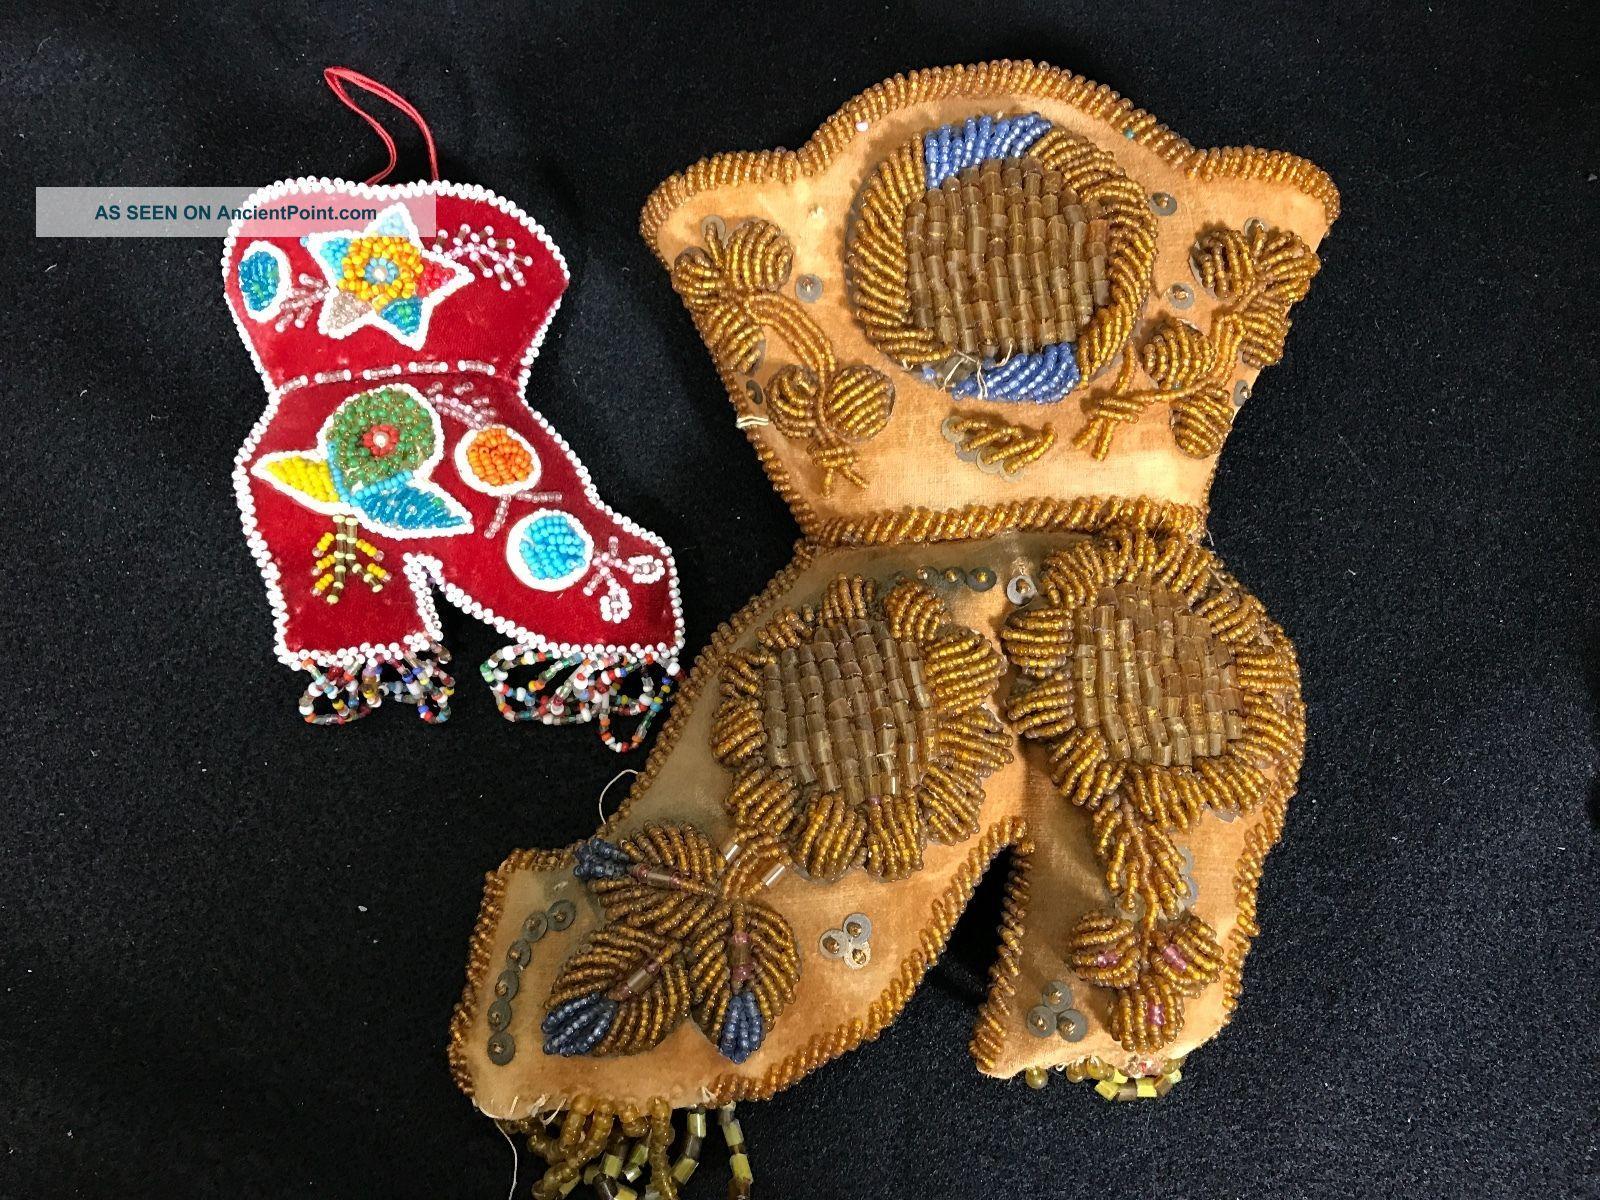 2 Iroquois Bead Work Boot Pin Cushions Native American Aafa Native American photo